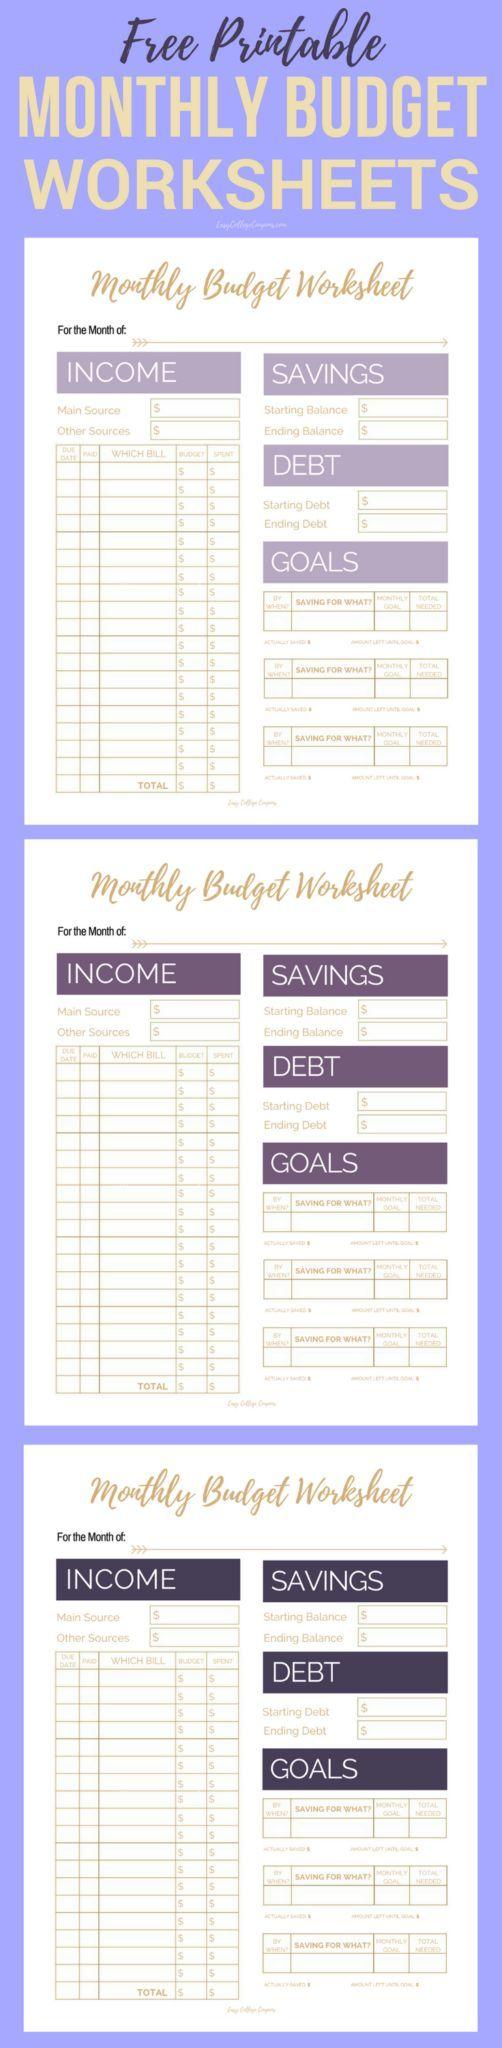 Worksheets Total Money Makeover Worksheets best 25 printable budget sheets ideas on pinterest free monthly worksheets